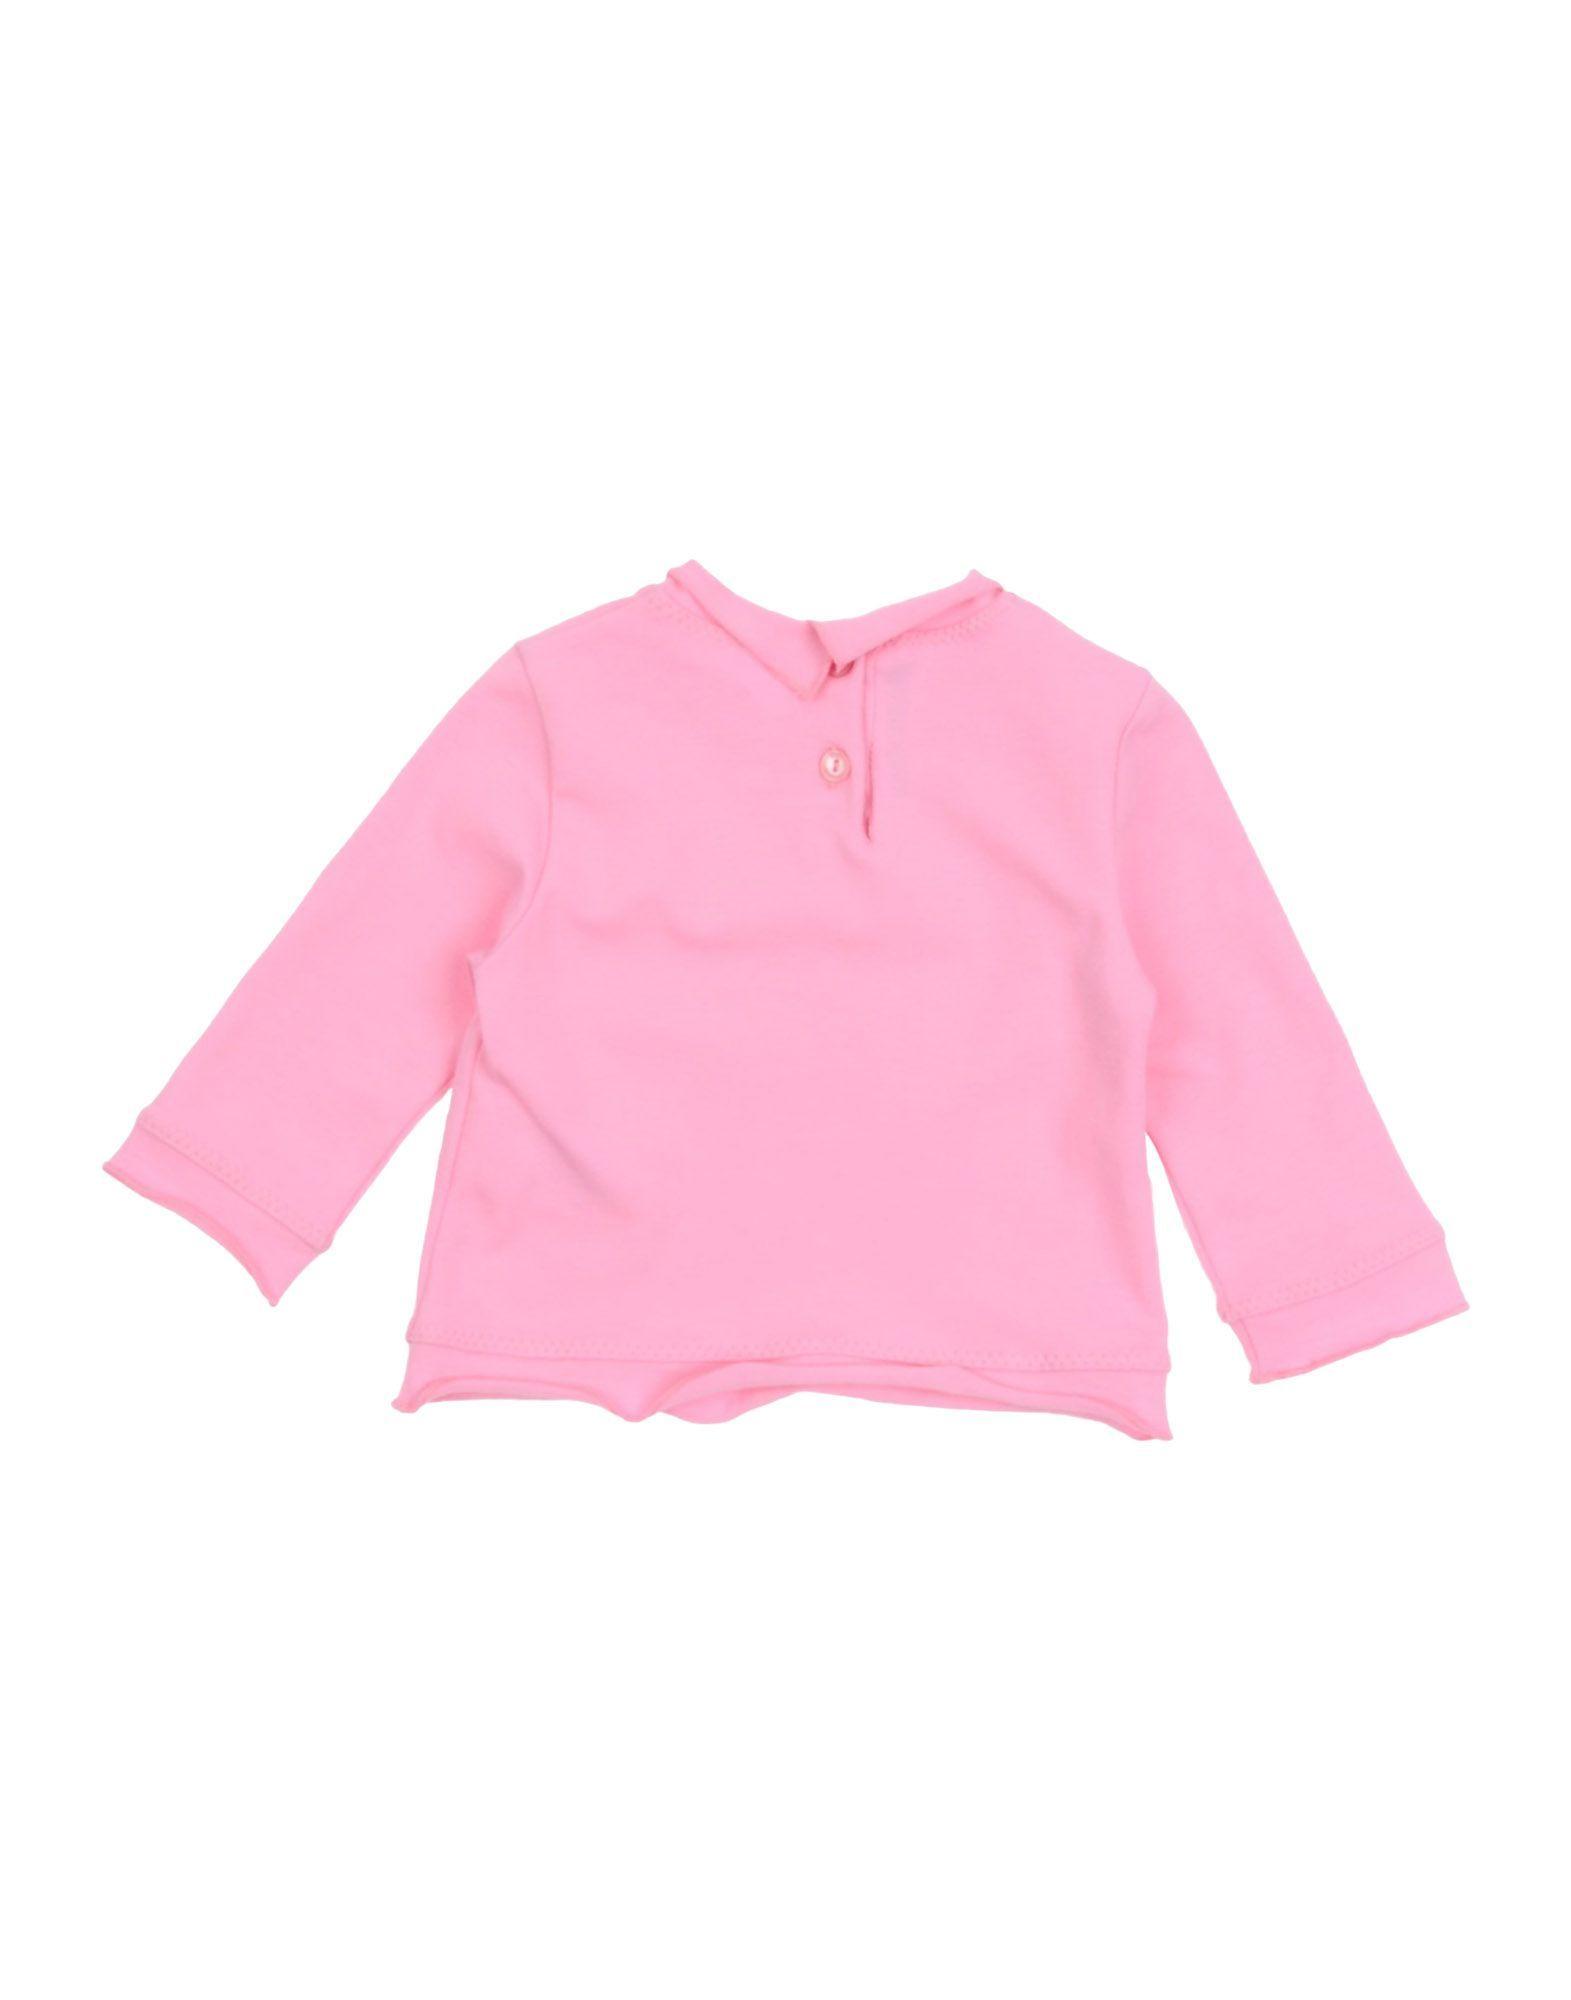 TOPWEAR Miss Blumarine Pink Girl Cotton